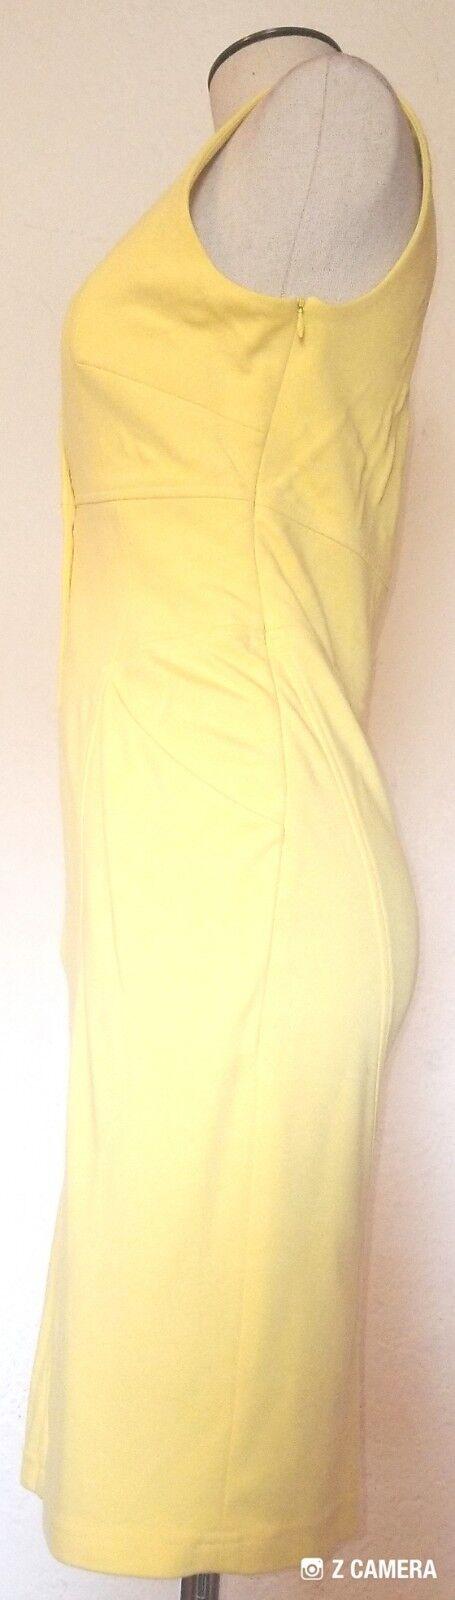 Catherine Malandrino Bright Yellow Dress Size S  - image 3